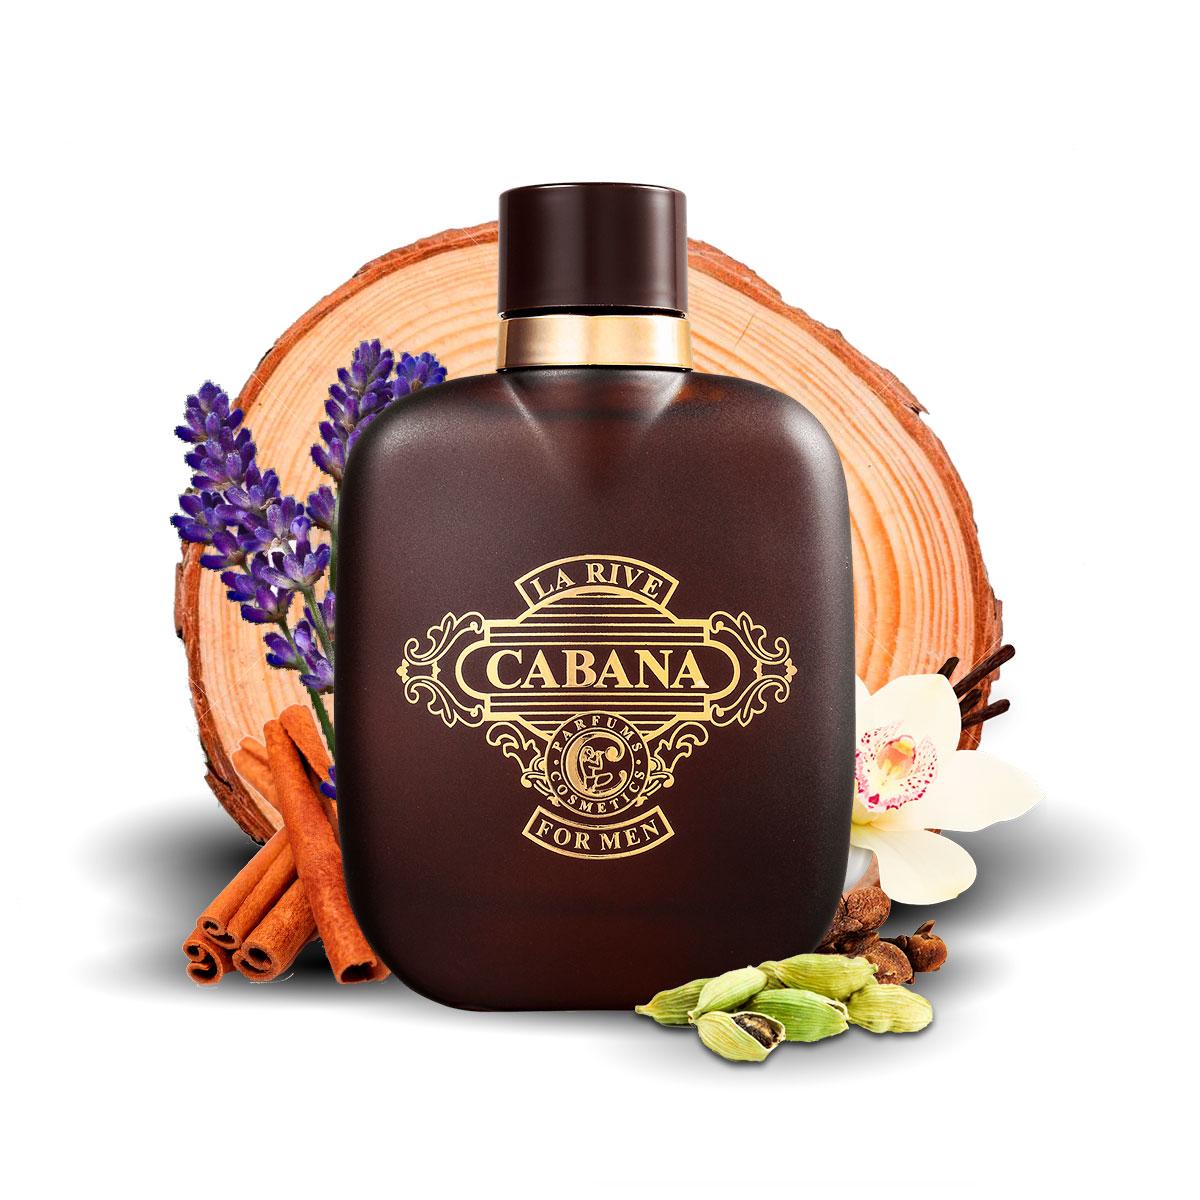 Kit 2 Perfumes Importados Cabana e Lexcellente La Rive